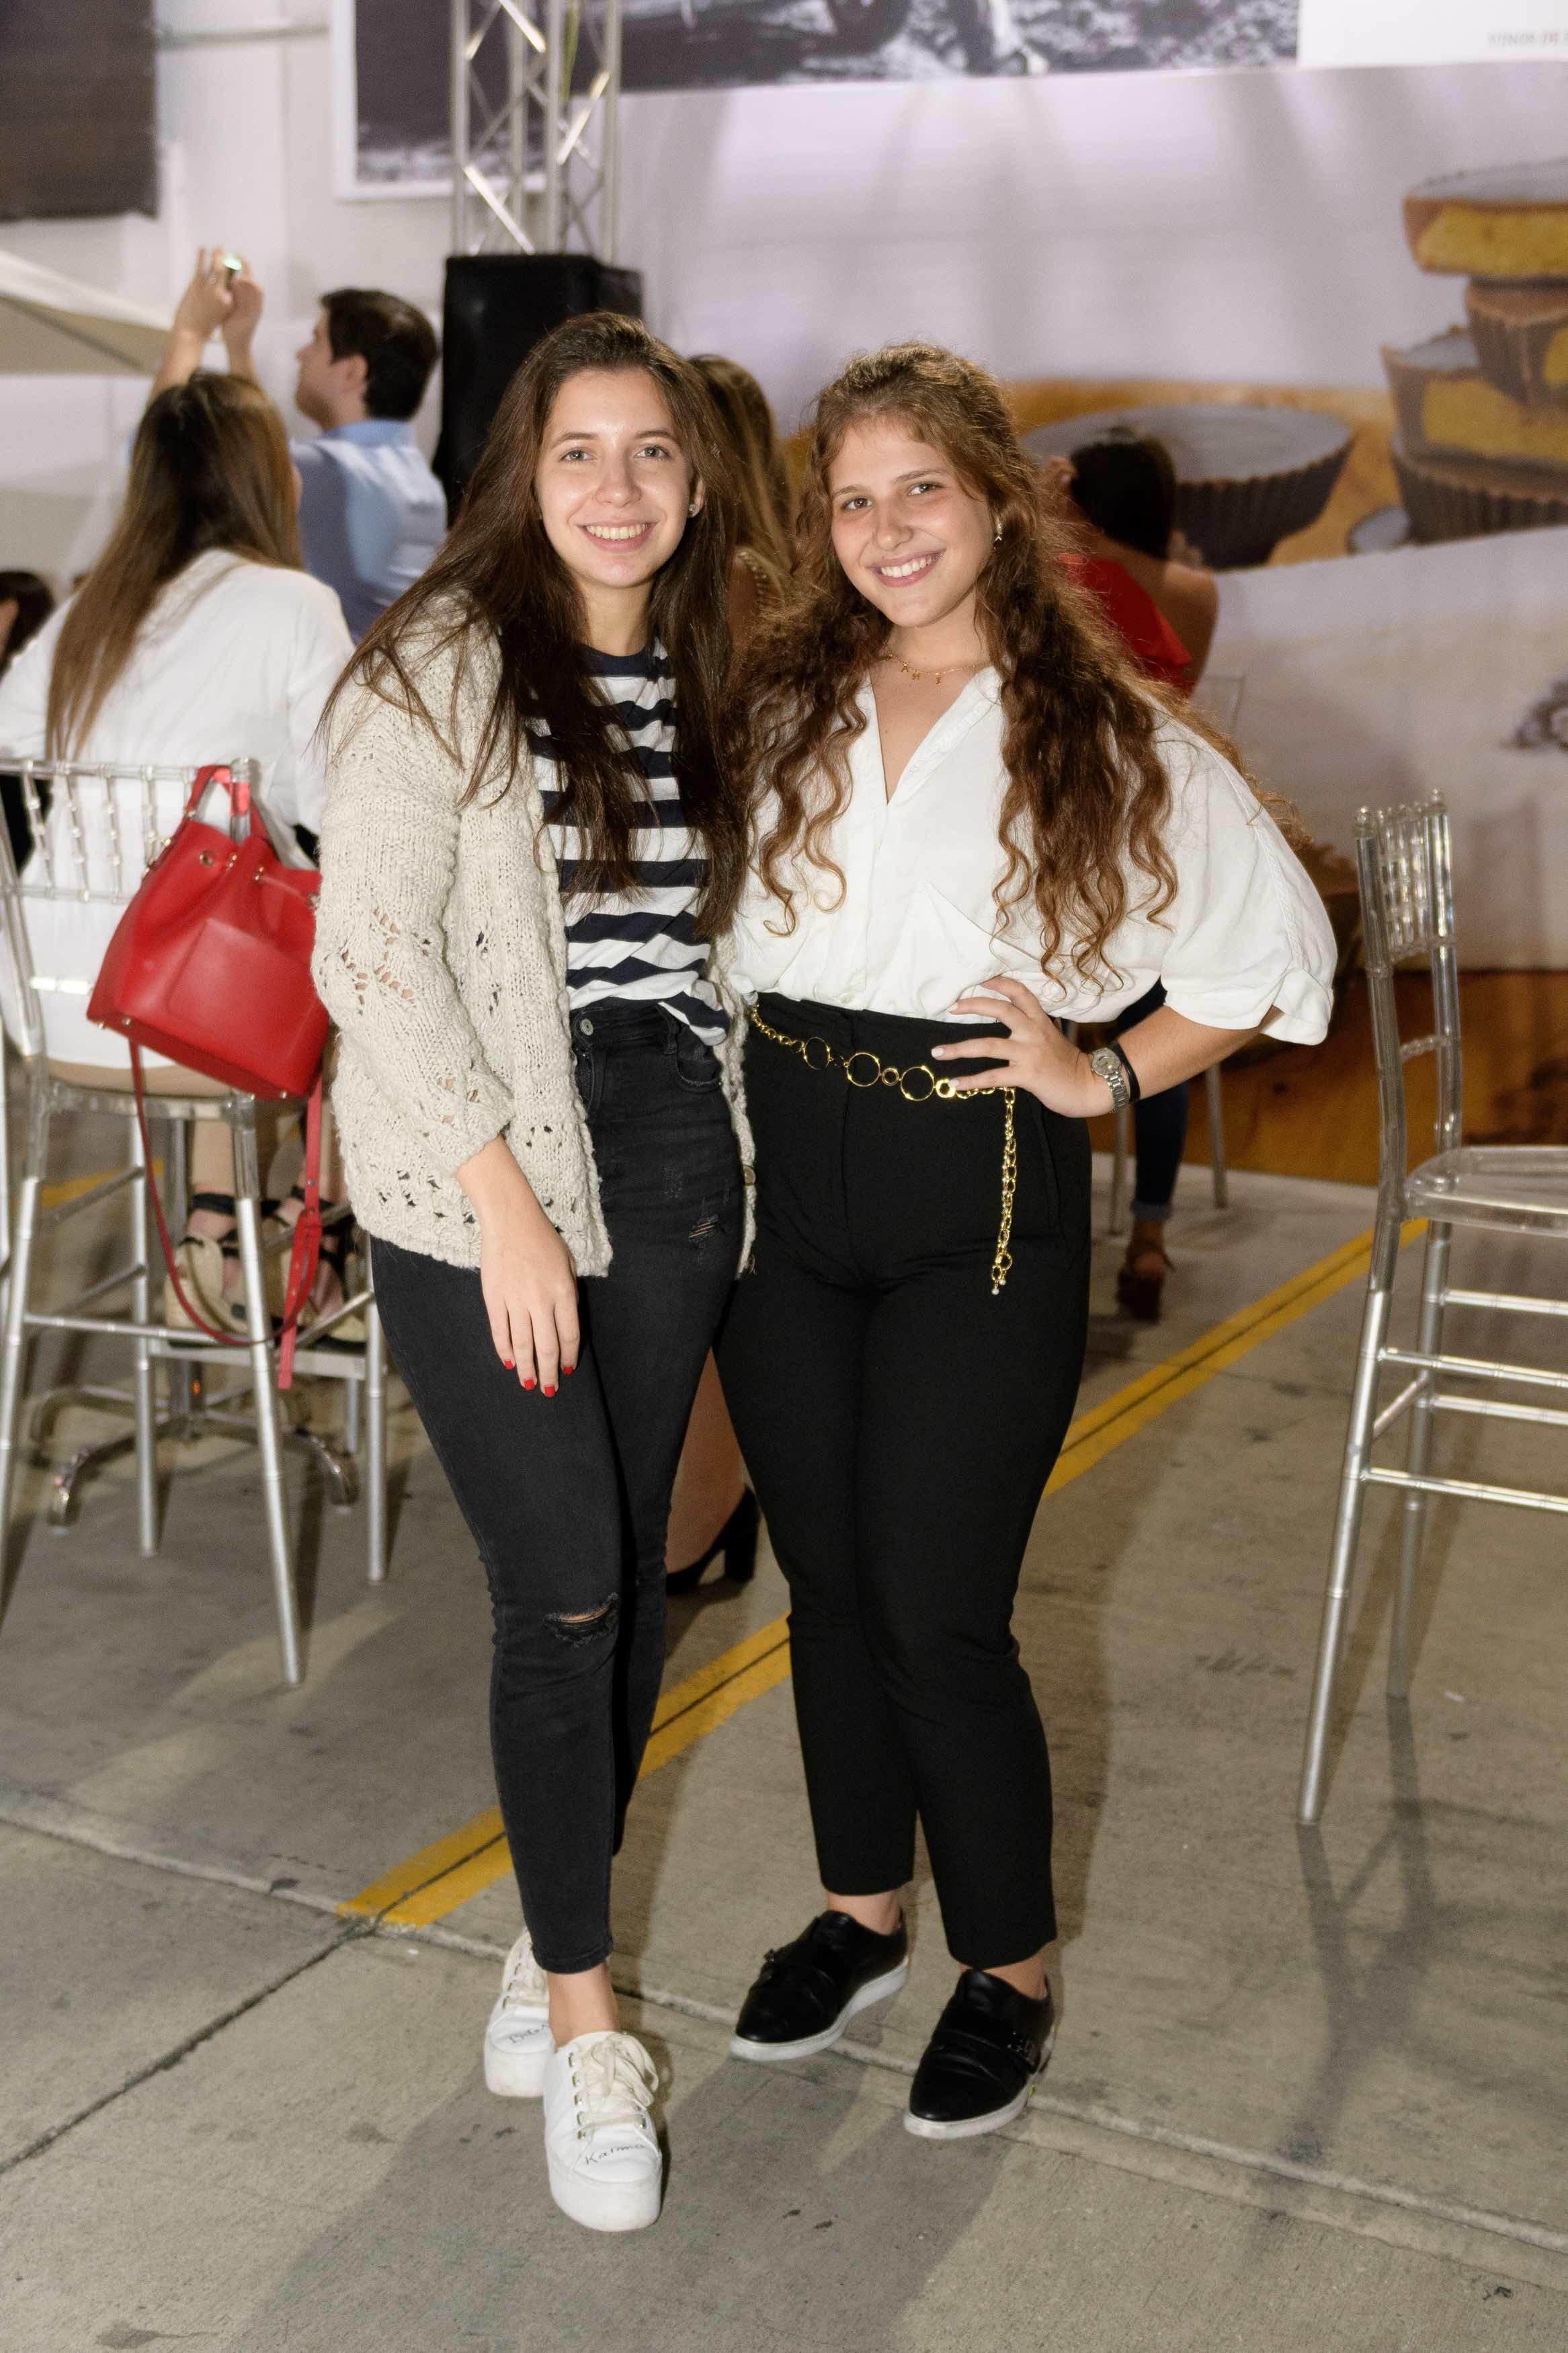 13. Shaylene Sahad & Maria Leroux